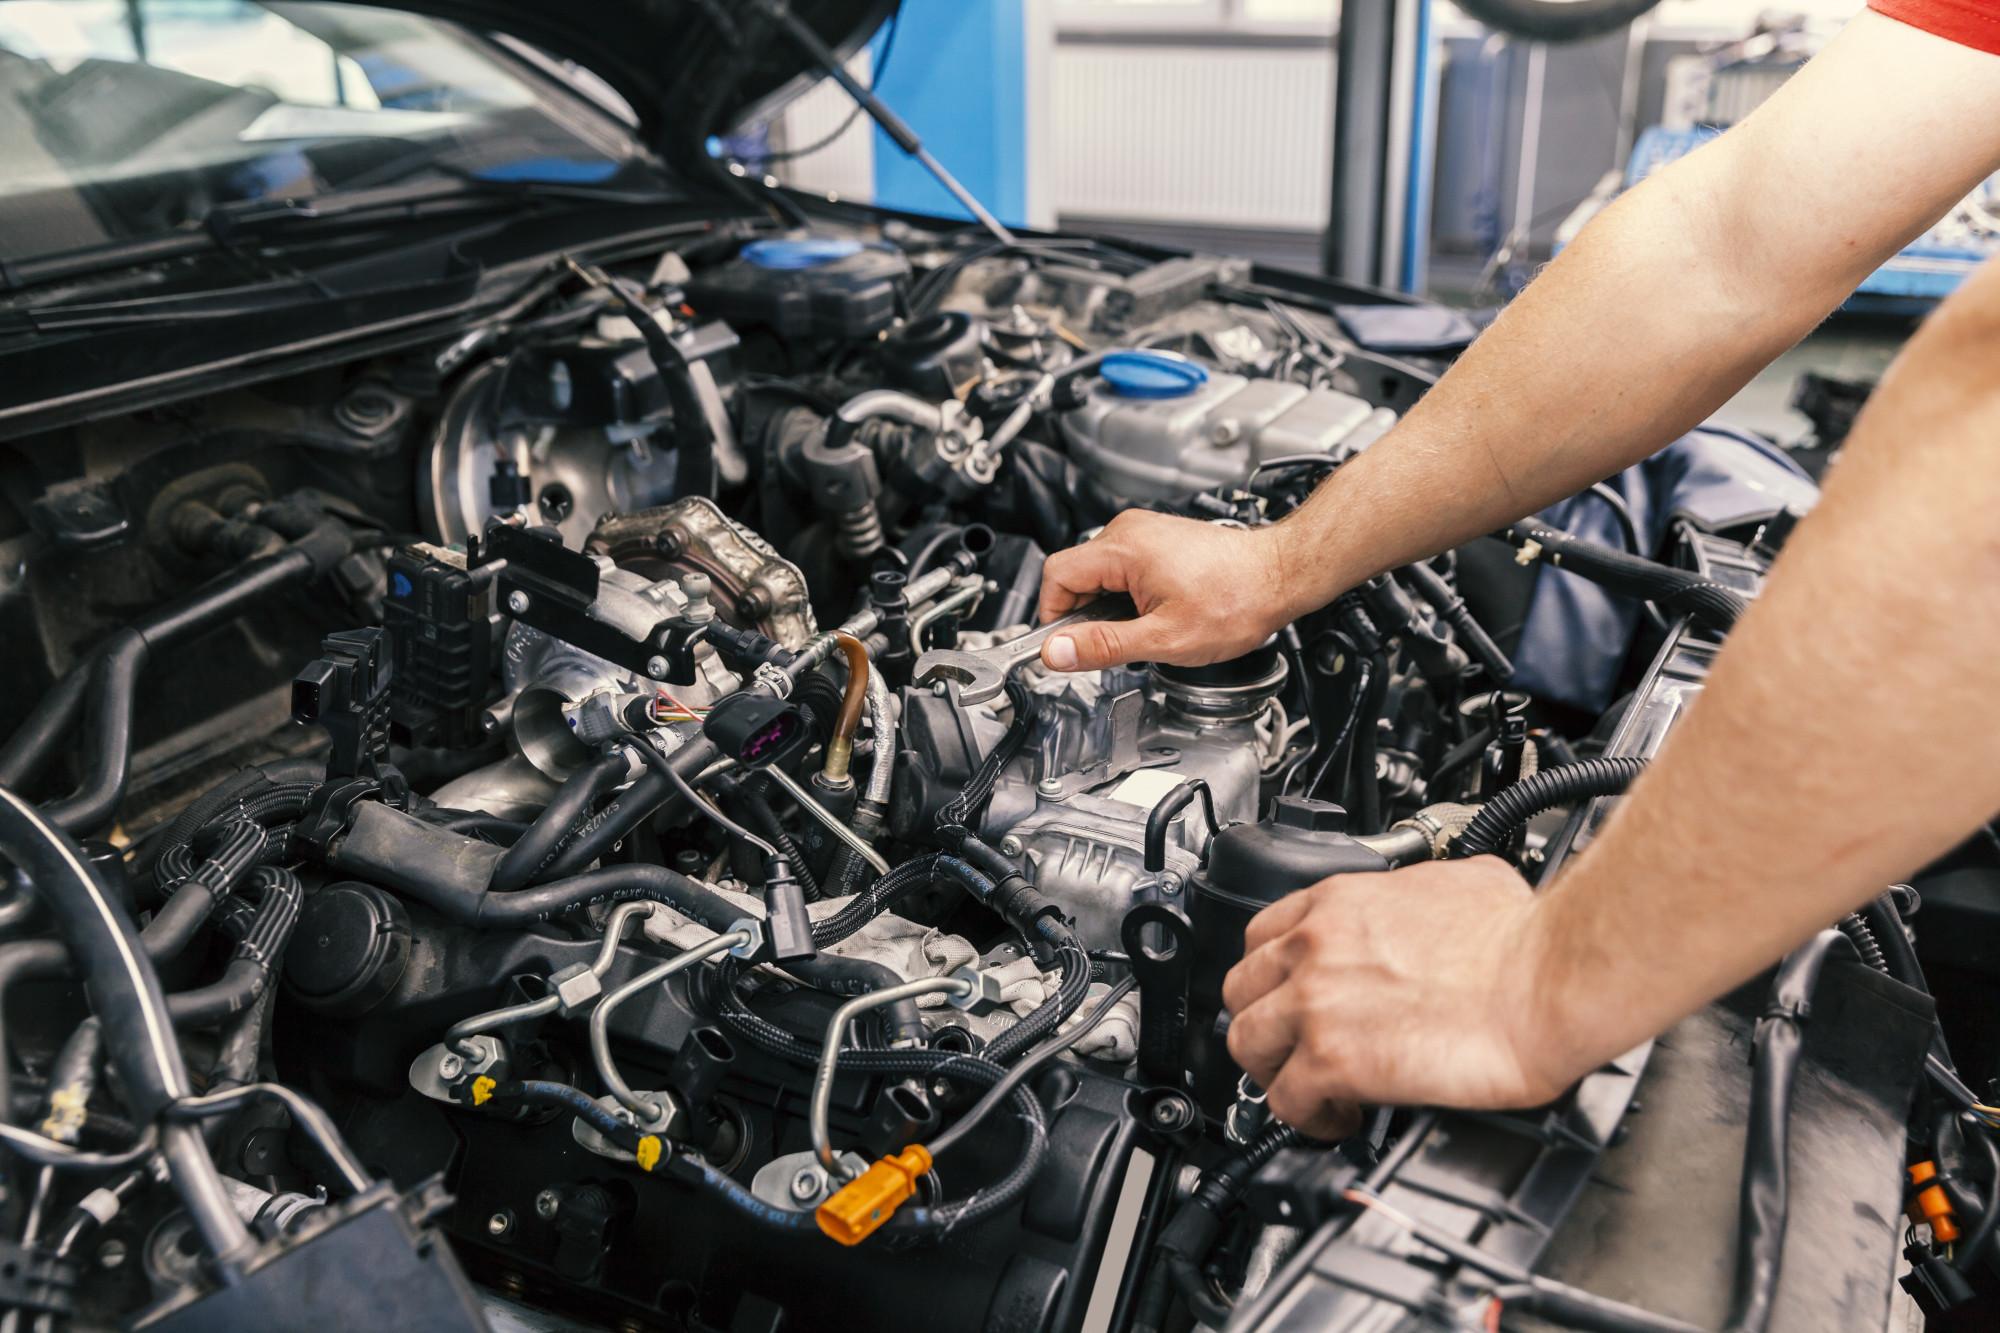 Purchasing Car Parts